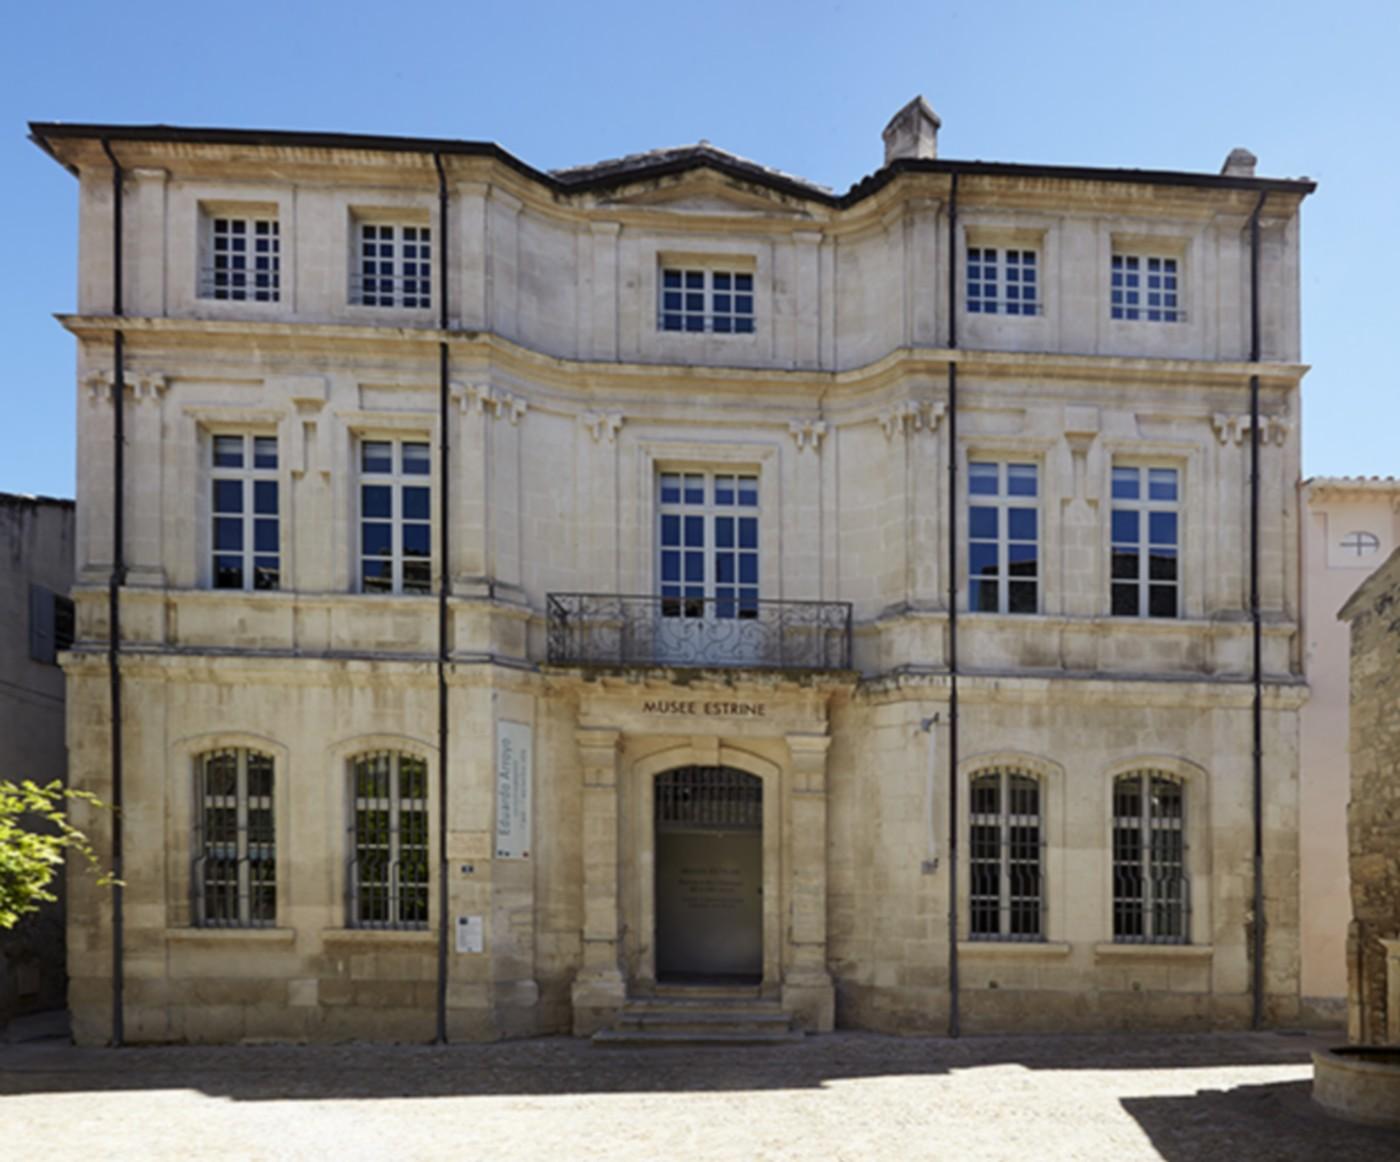 musee-estrine-centre-d-interpretation-vincent-van-gogh